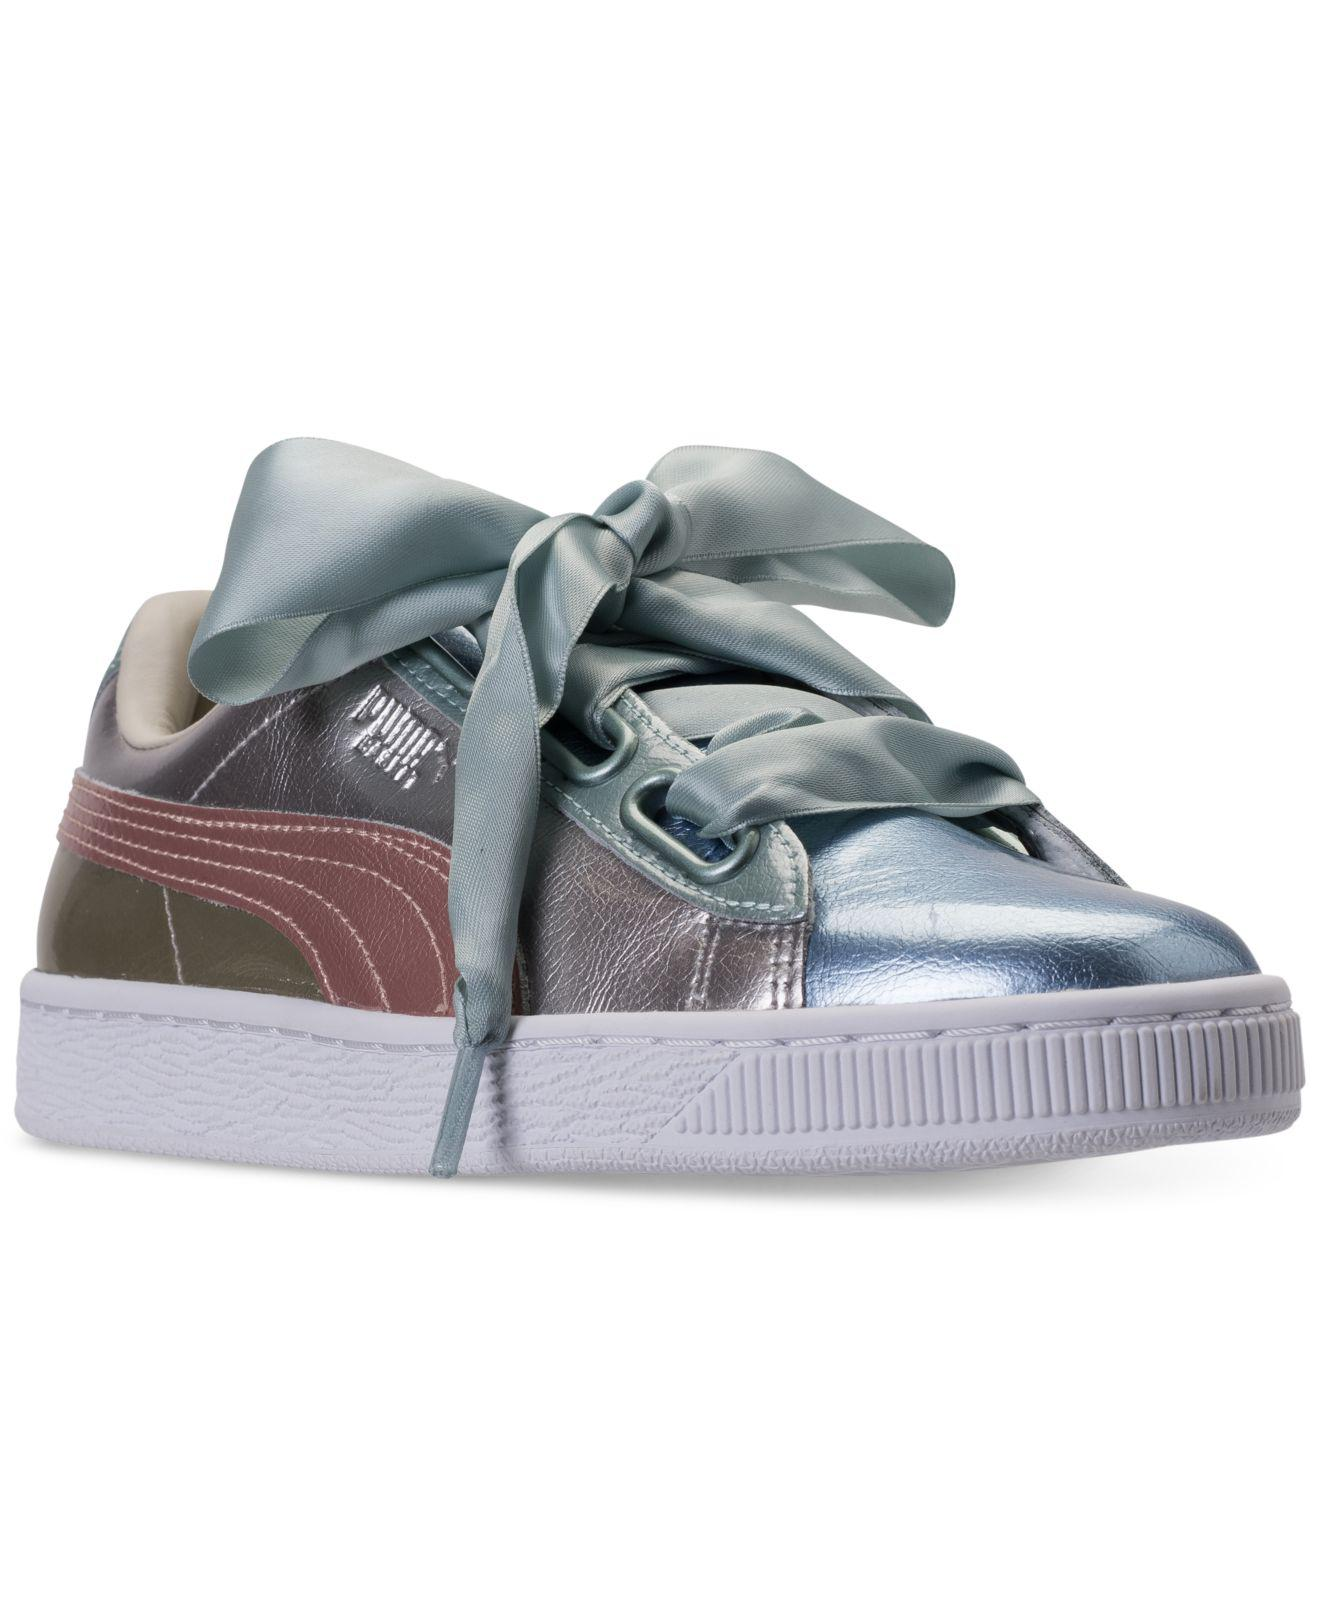 Metallic 5 Puma Bauble Sneakers7 Basket B Heart oCxedB